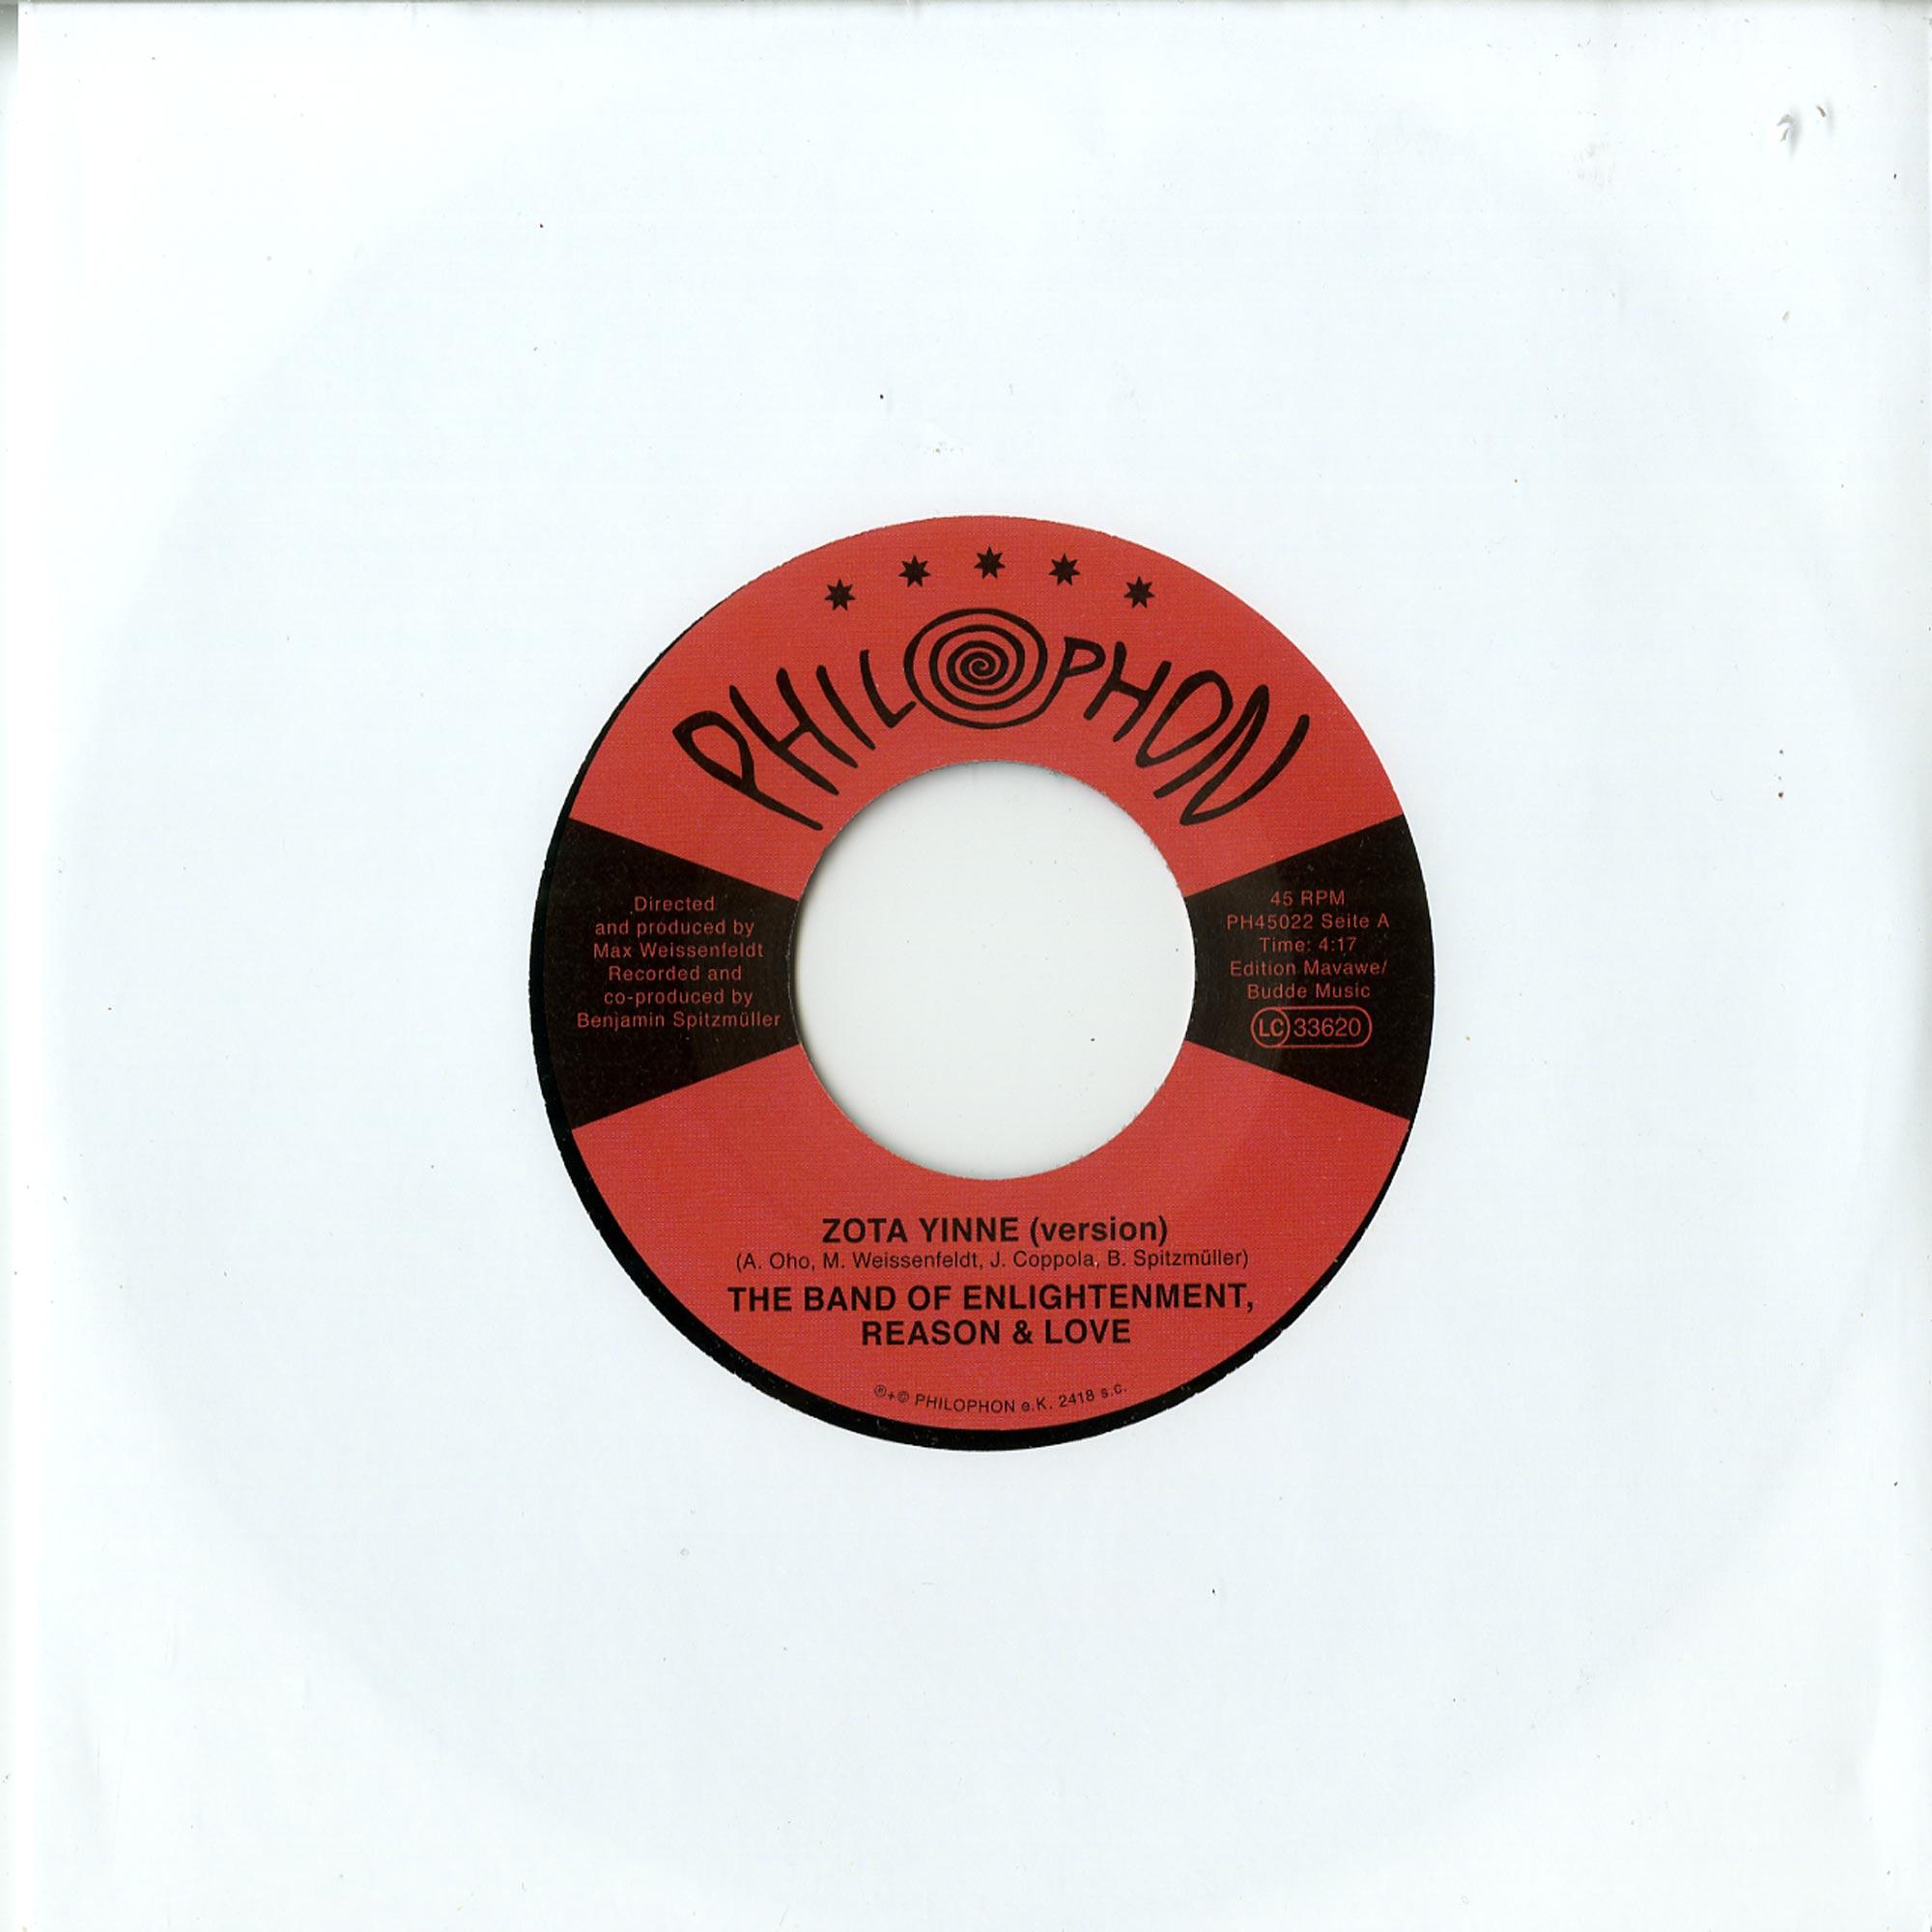 The Band Of Enlightenment Reason & Love - ZOTA YINNE